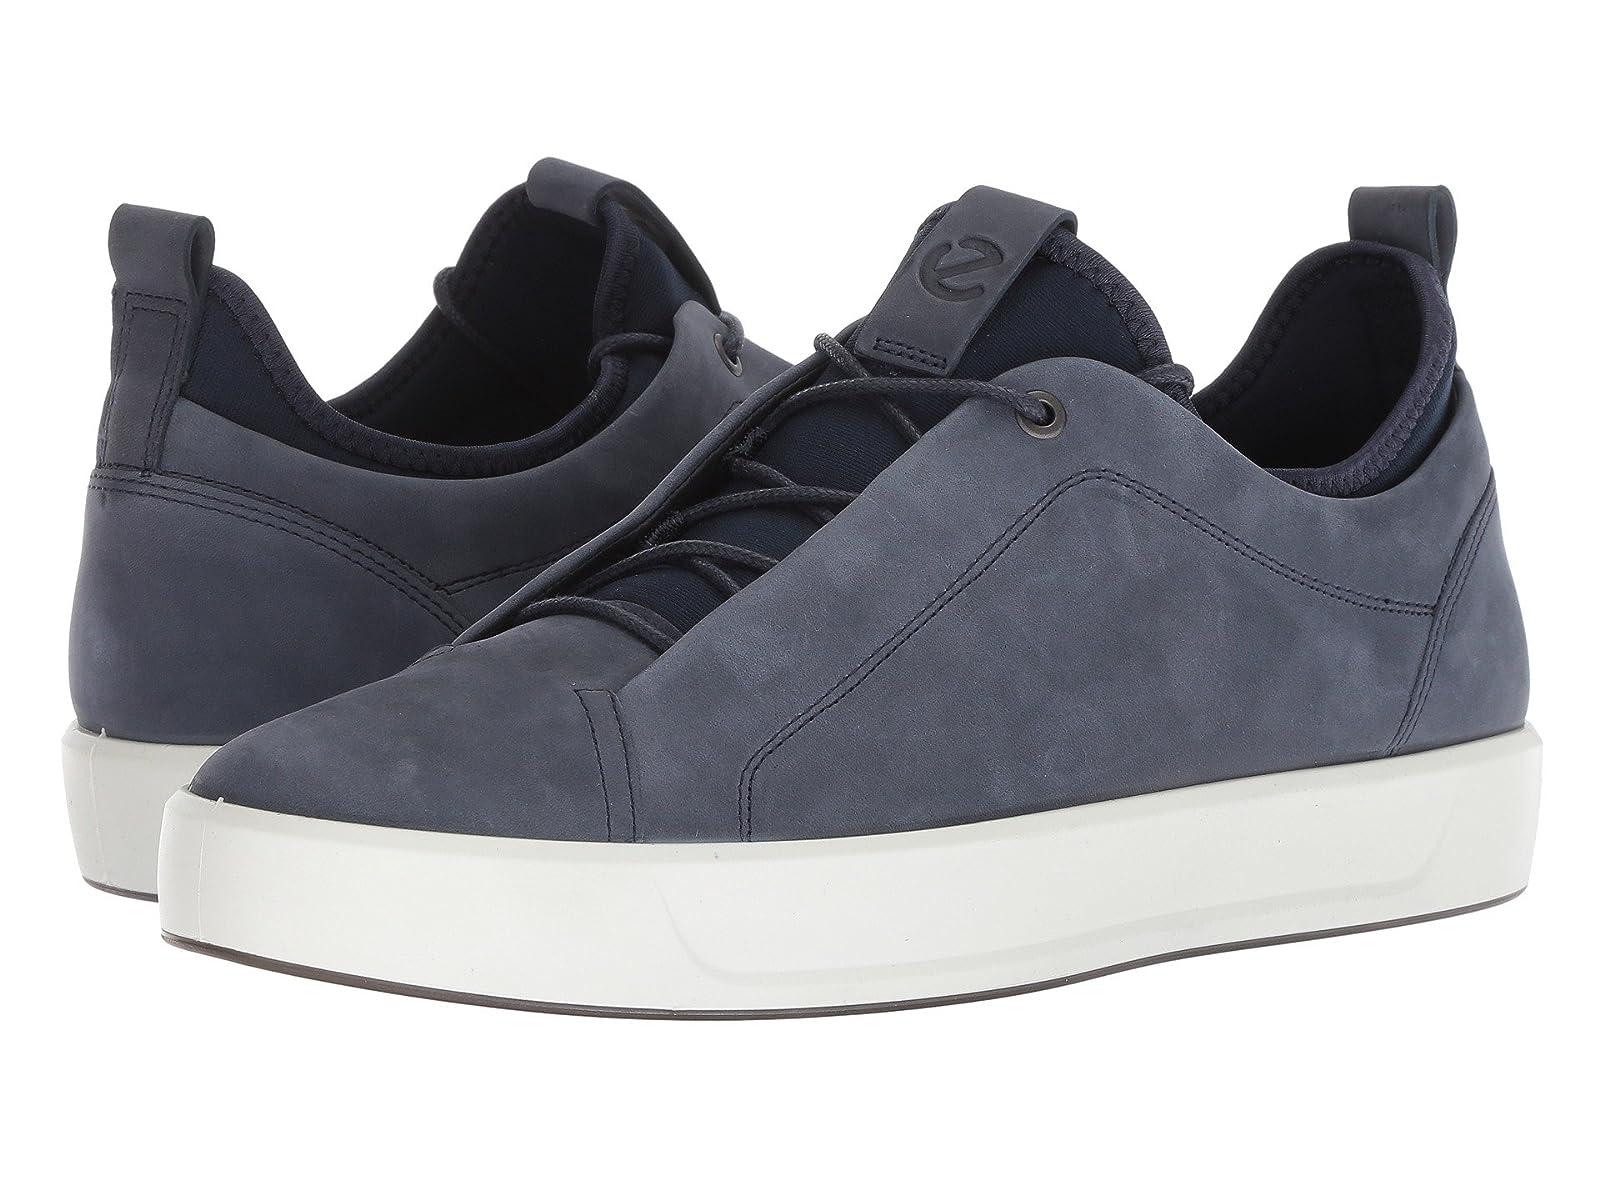 ECCO Soft 8 LowAtmospheric grades have affordable shoes